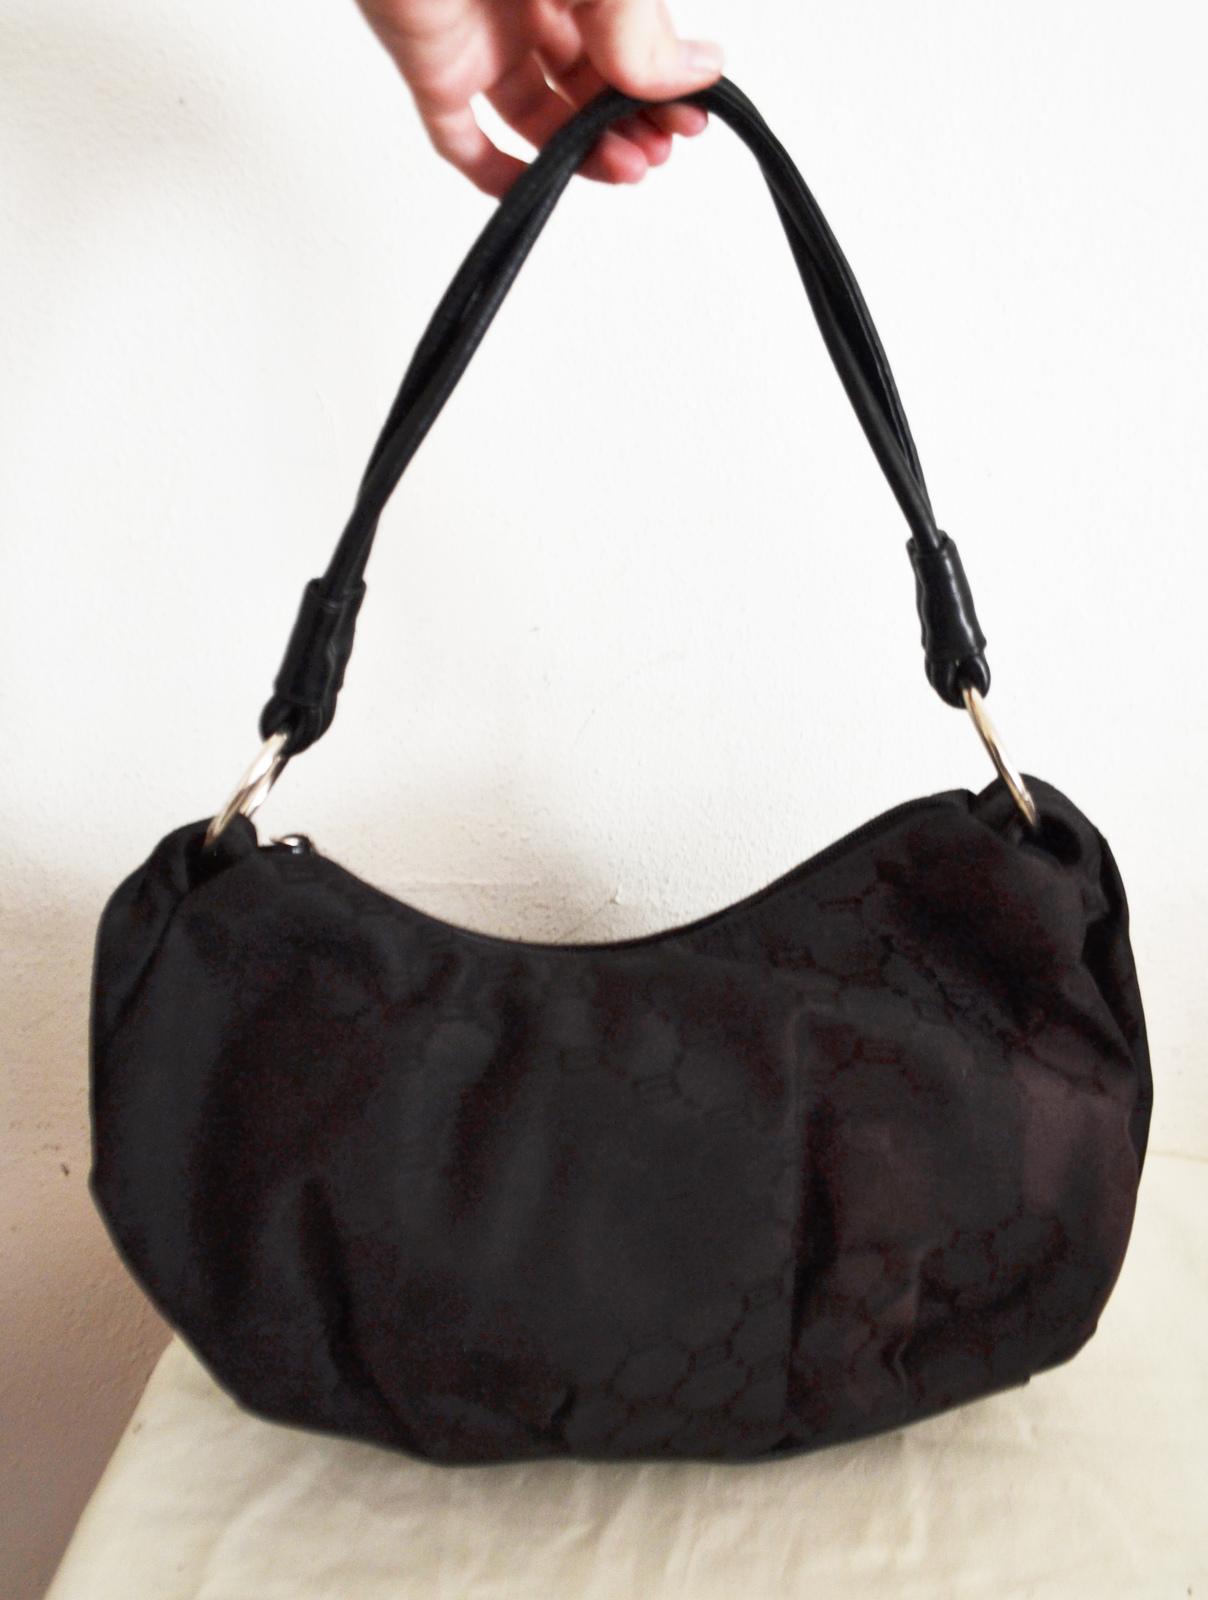 bcc9c2b3fff Signature Cato Purse Black Nylon Leather Shoulder Bag -  24.99